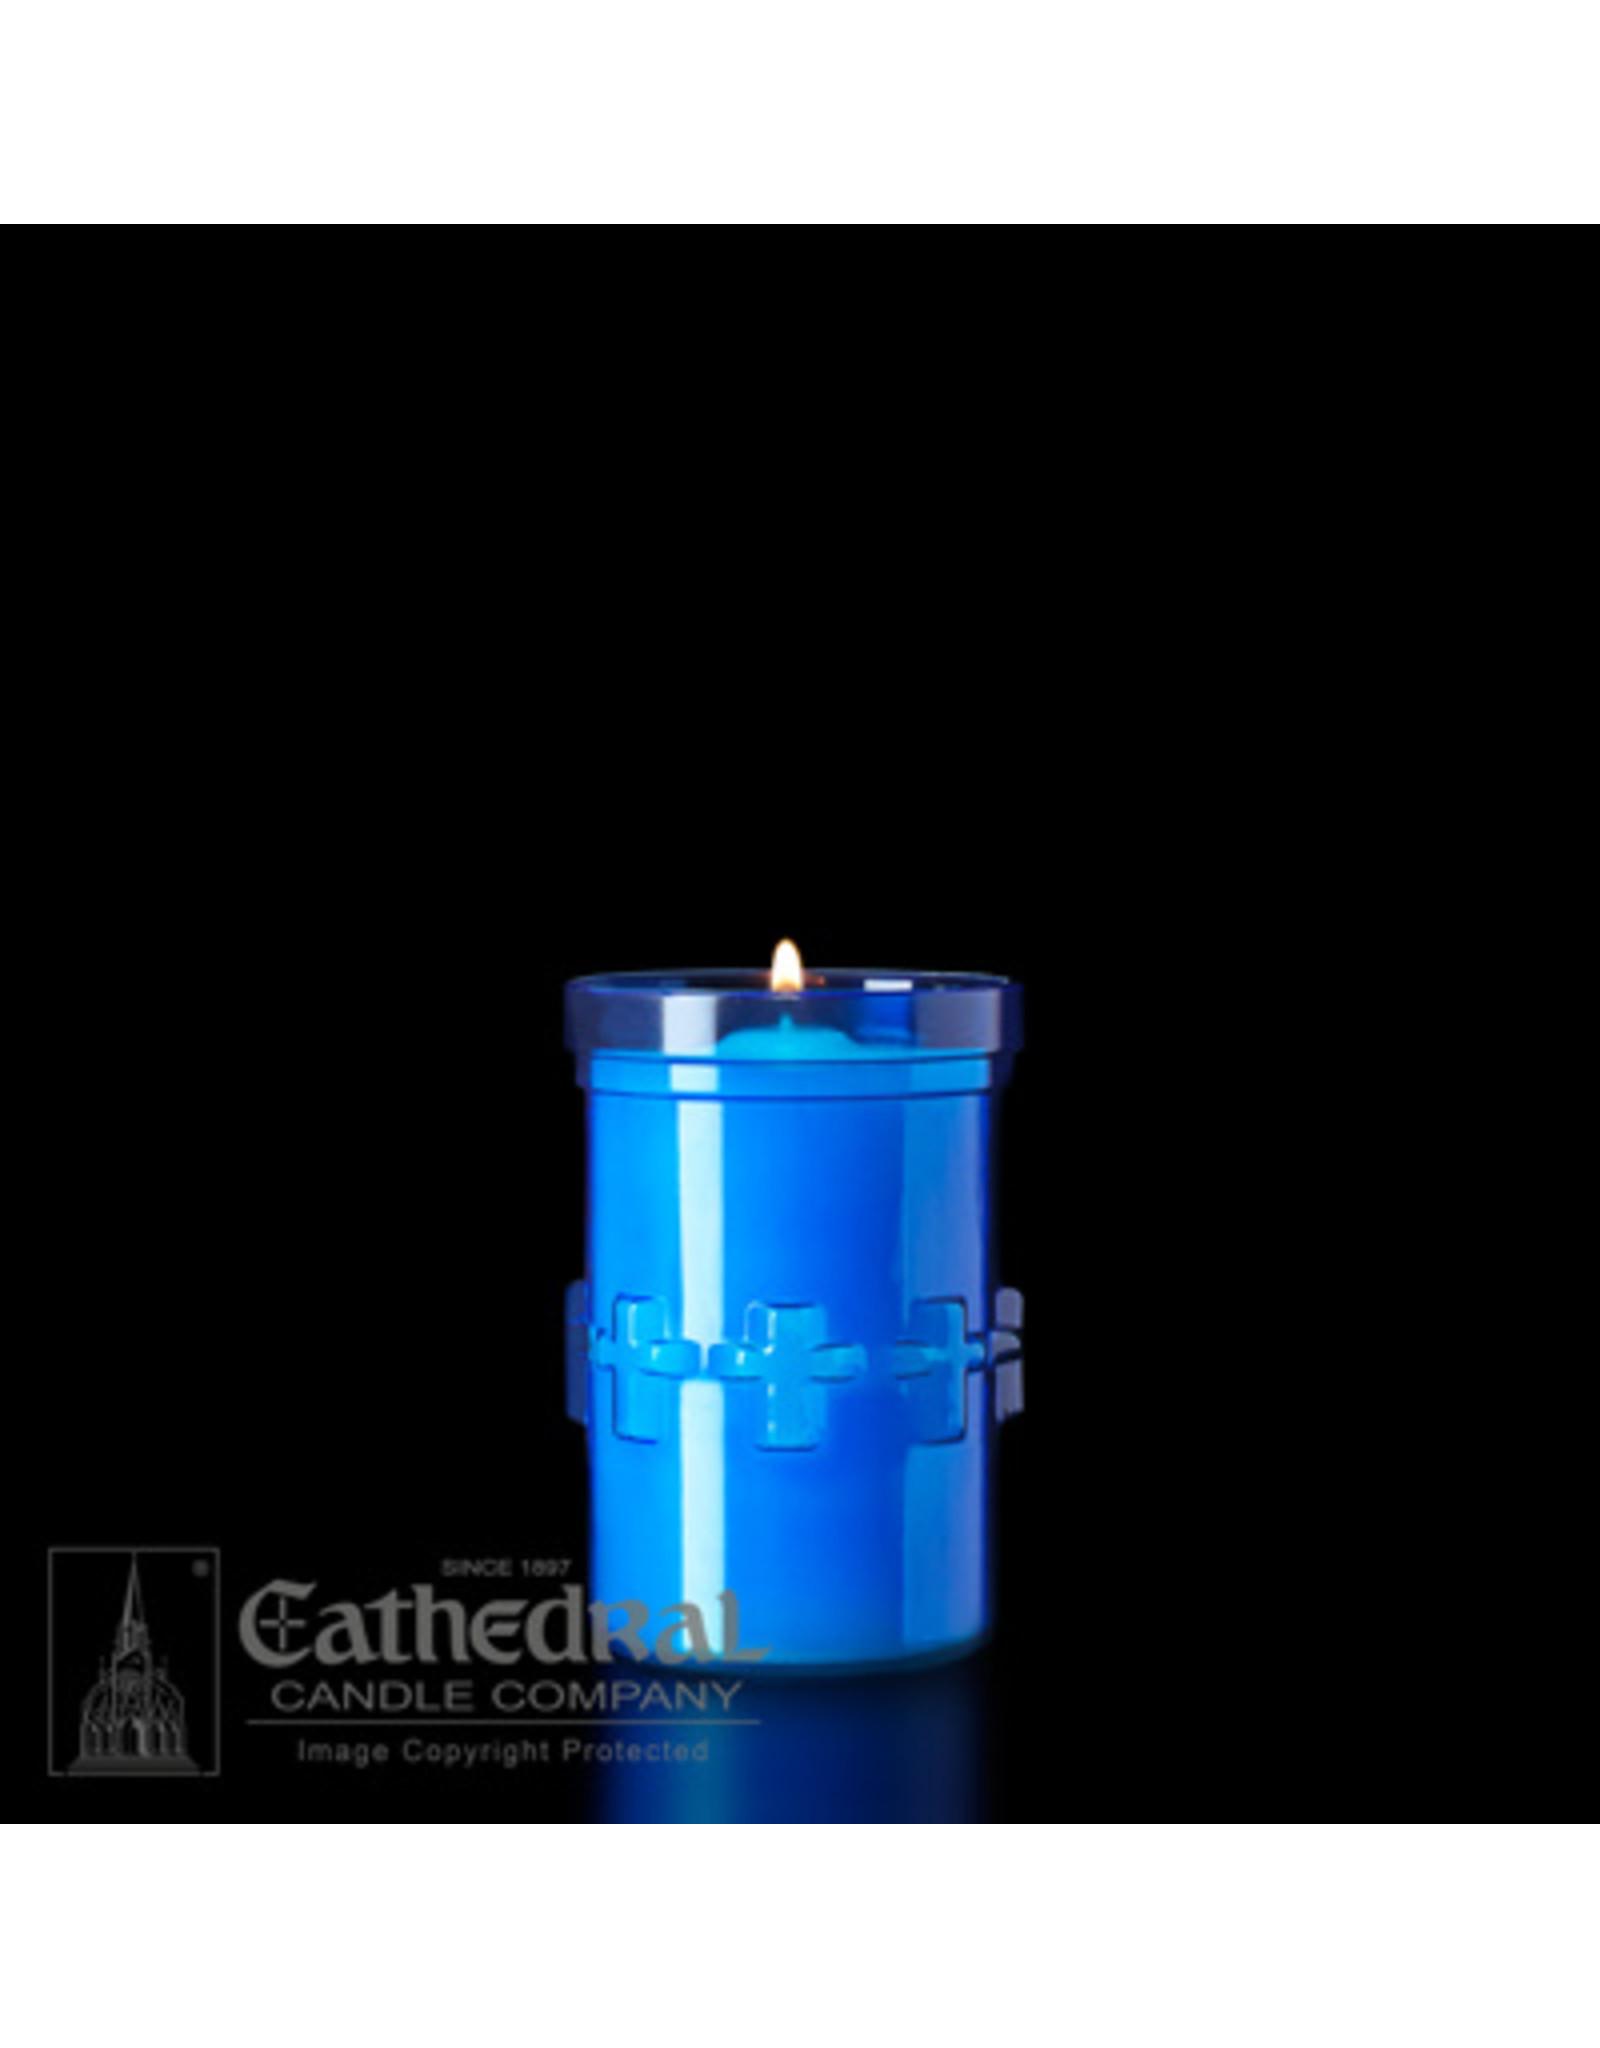 CNDL DEVOTIONA-LITE 3-DAY BLUE